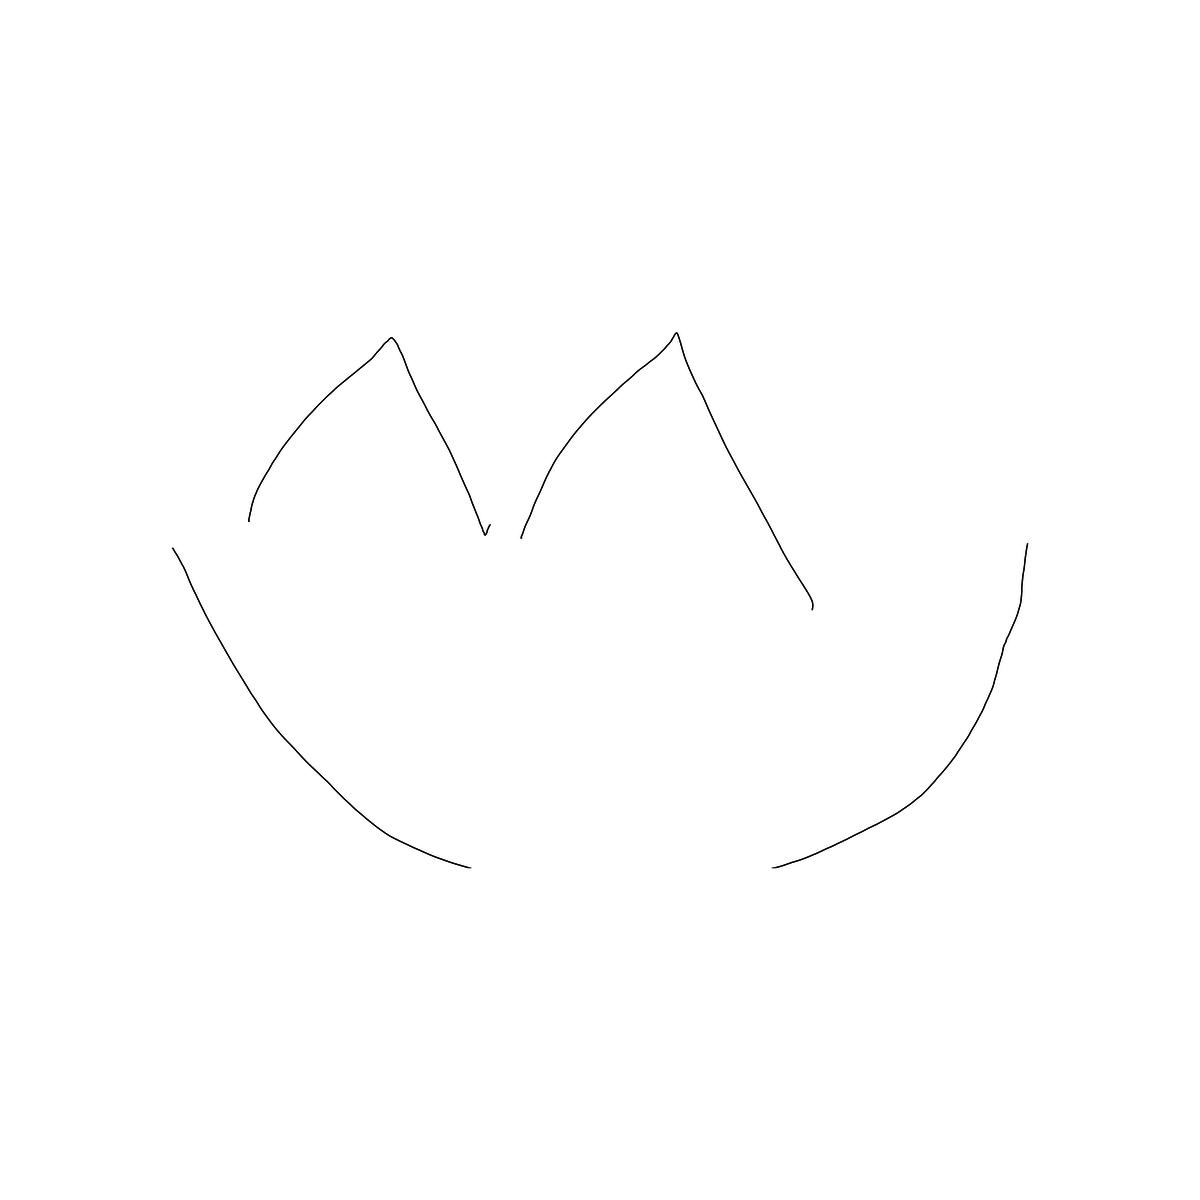 BAAAM drawing#15712 lat:48.2126464843750000lng: 16.3697357177734380